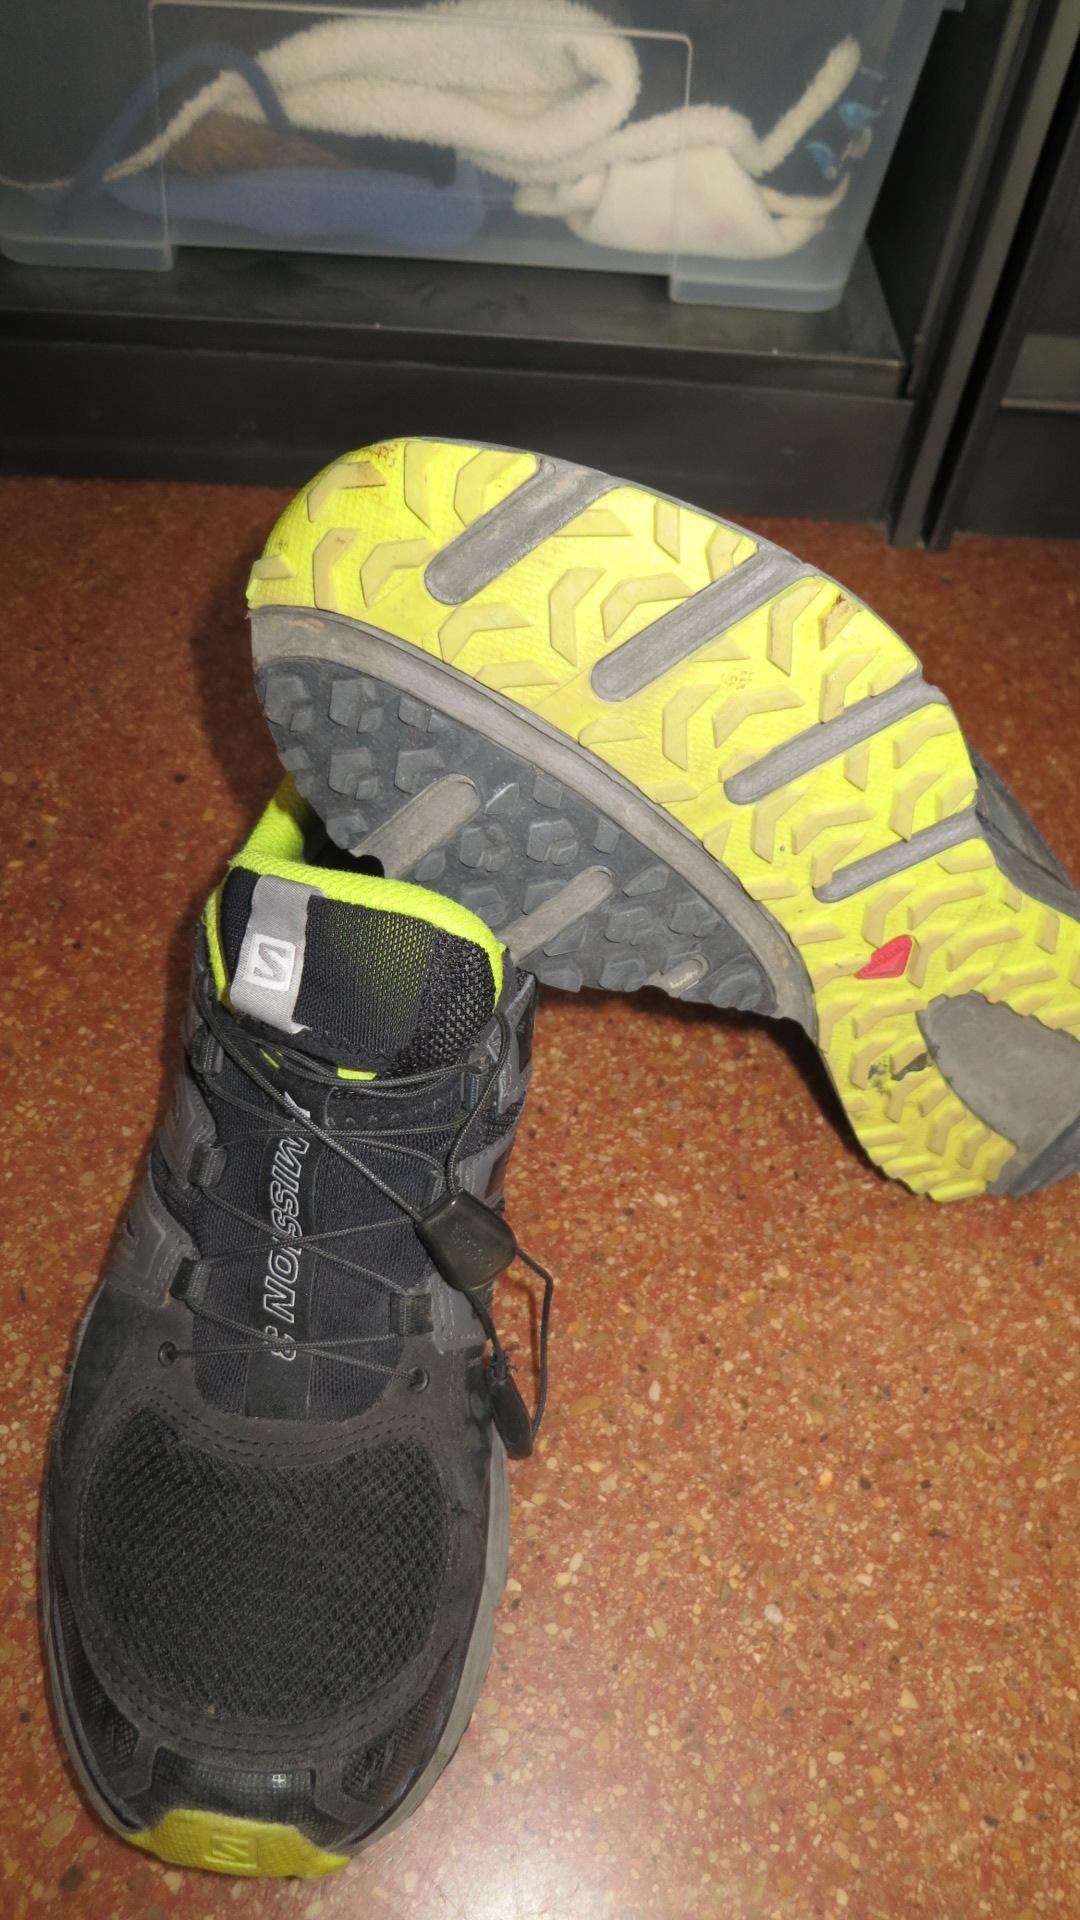 Chaussures Salomon – Tico Boo Cycles